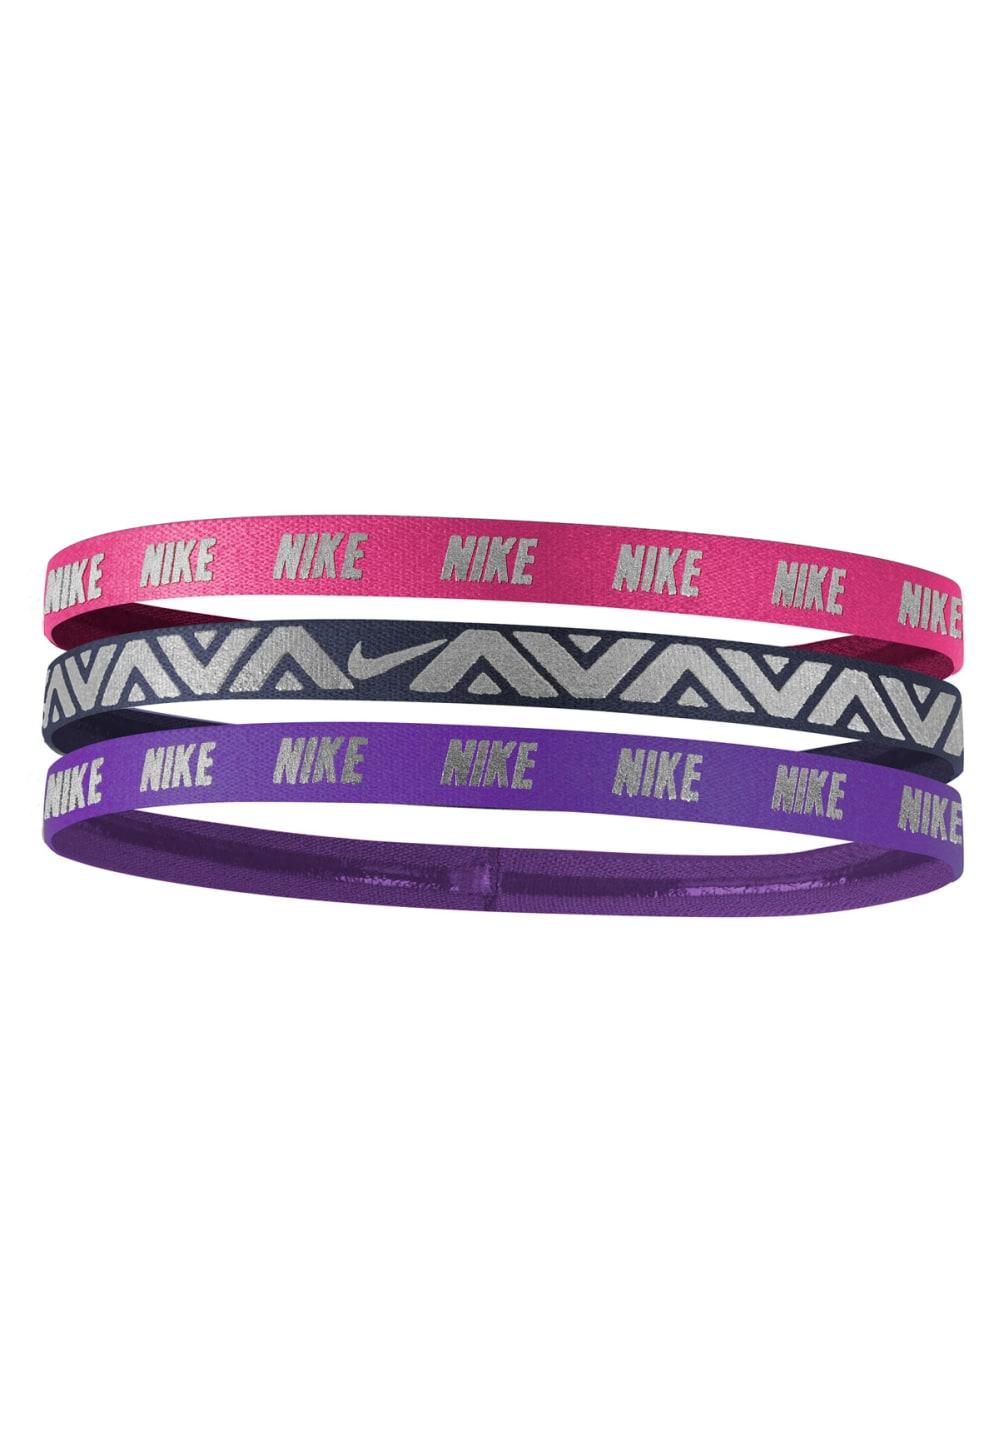 6ac7b84dcd50a Nike Metallic Hairbands 3 Pack - Headdress - Purple